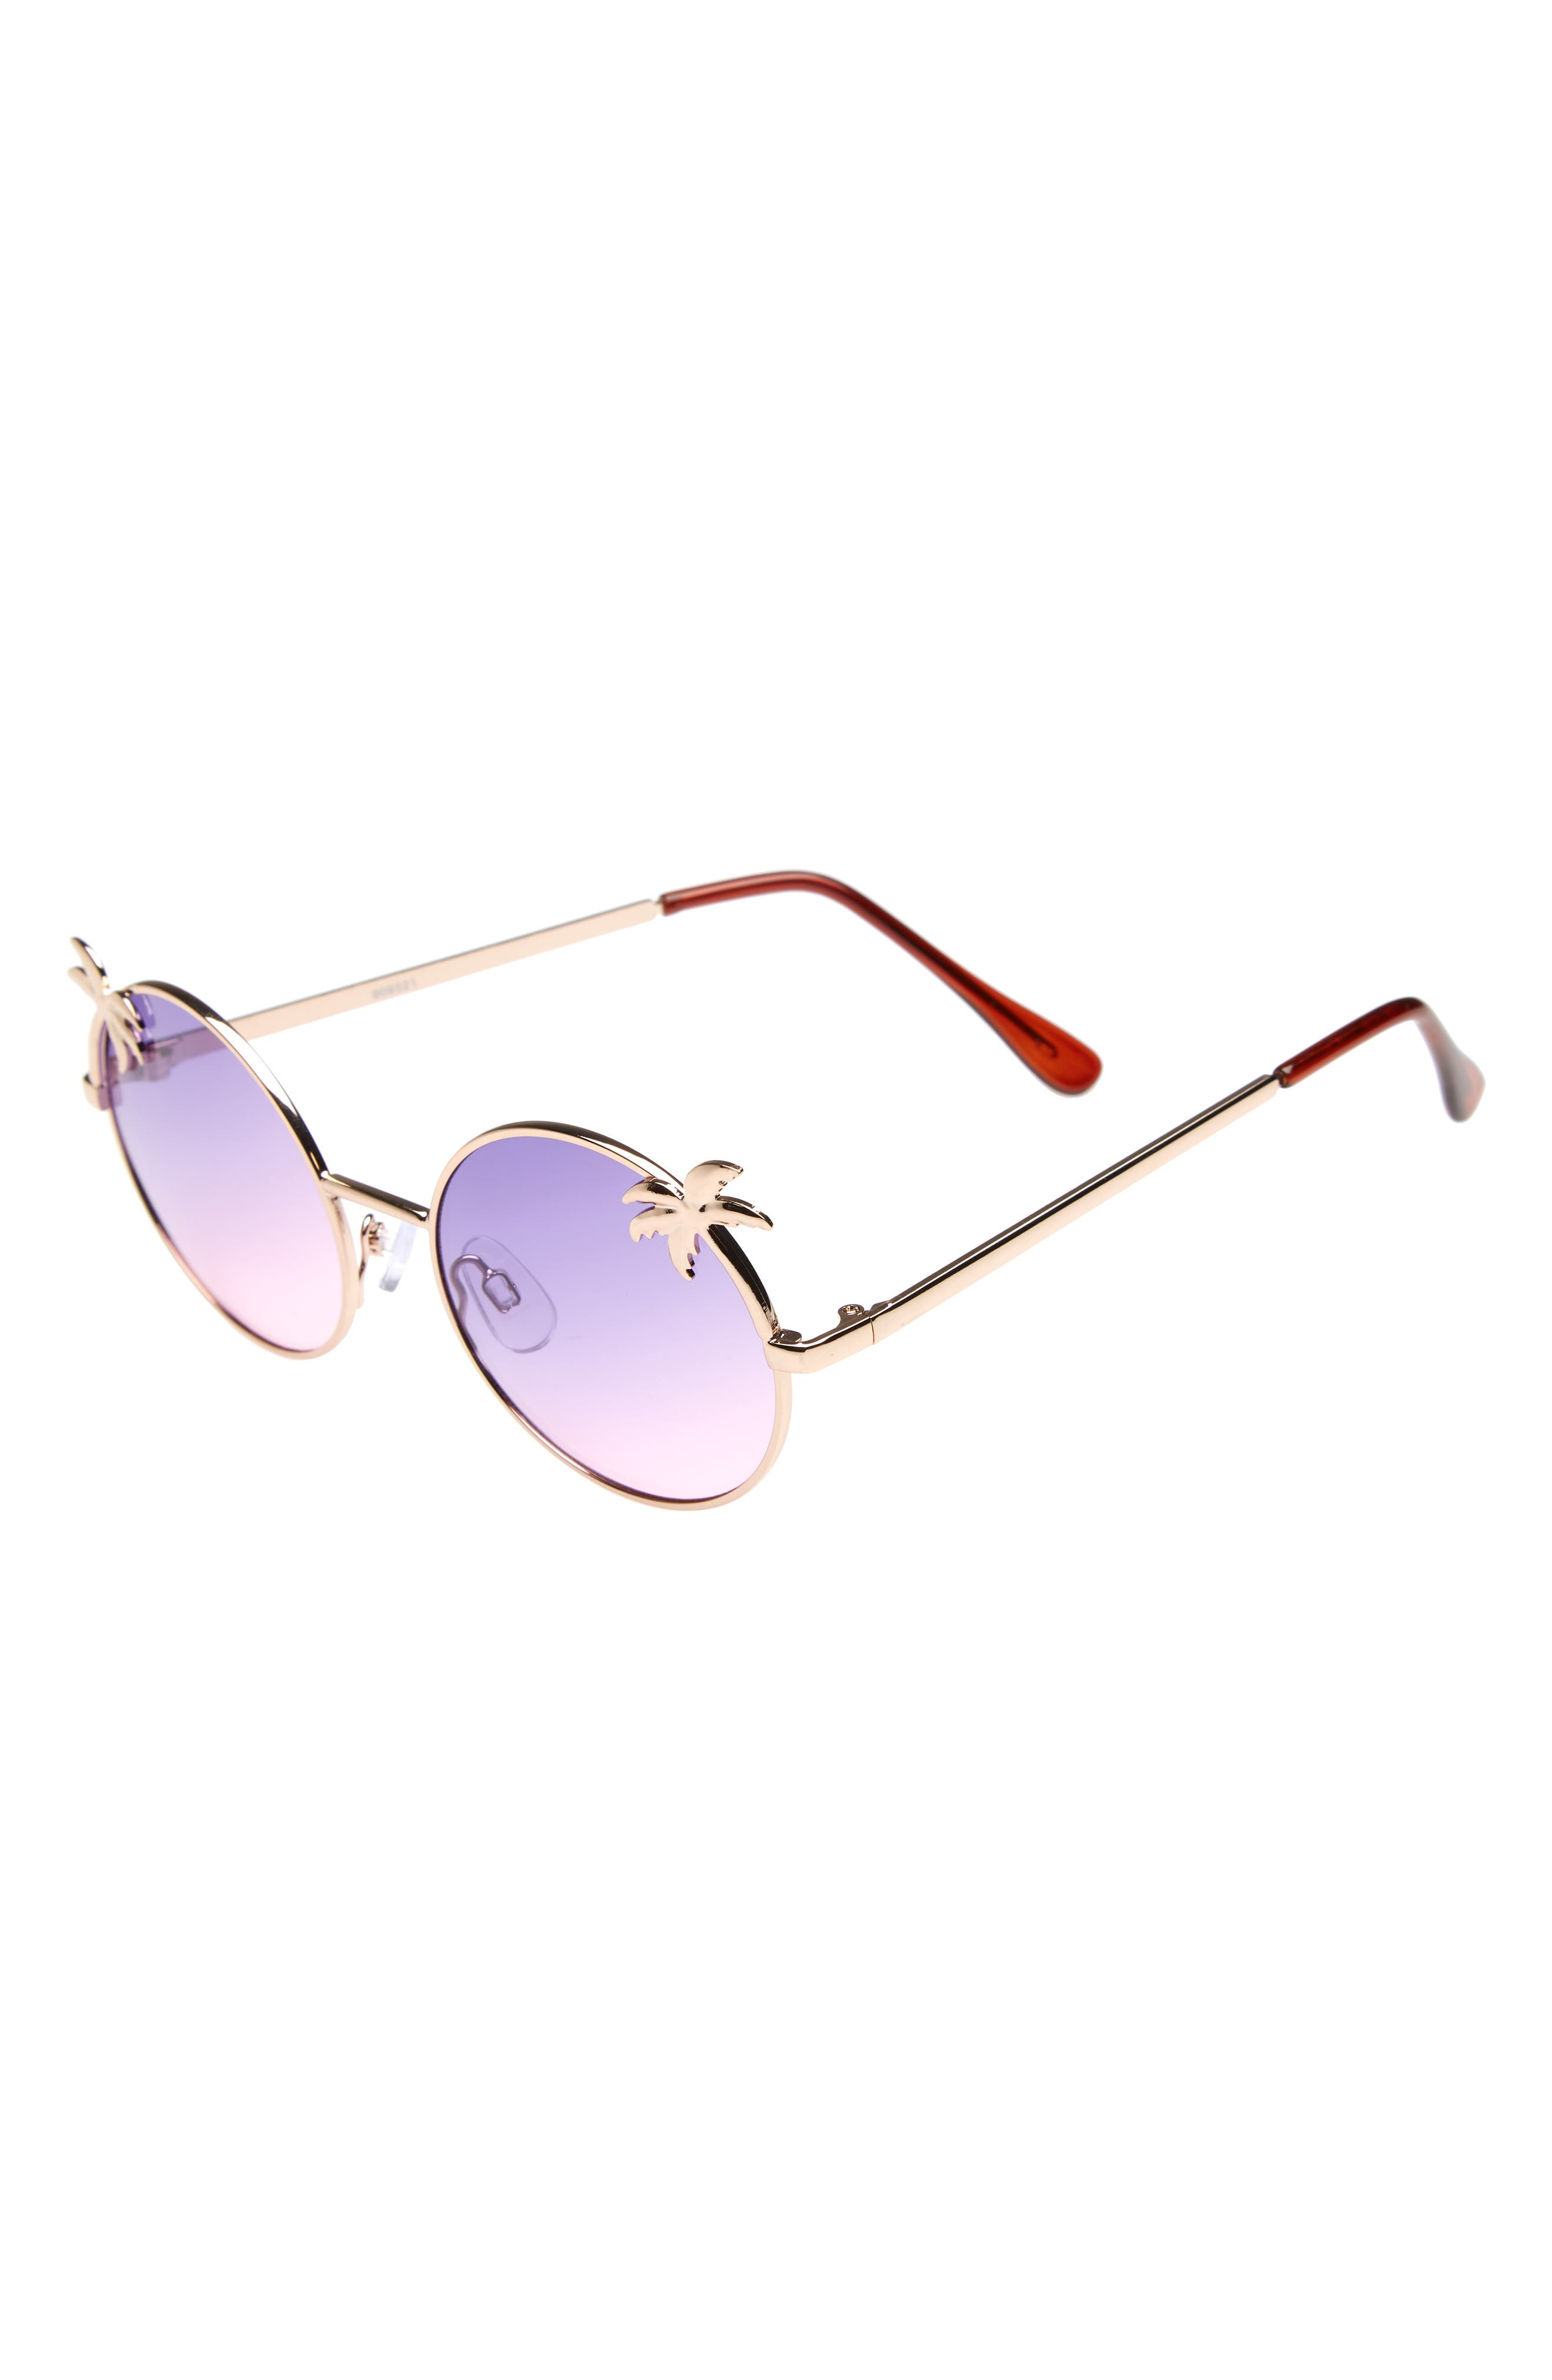 Palm Tree Sunglasses,                             Main thumbnail 1, color,                             Purple